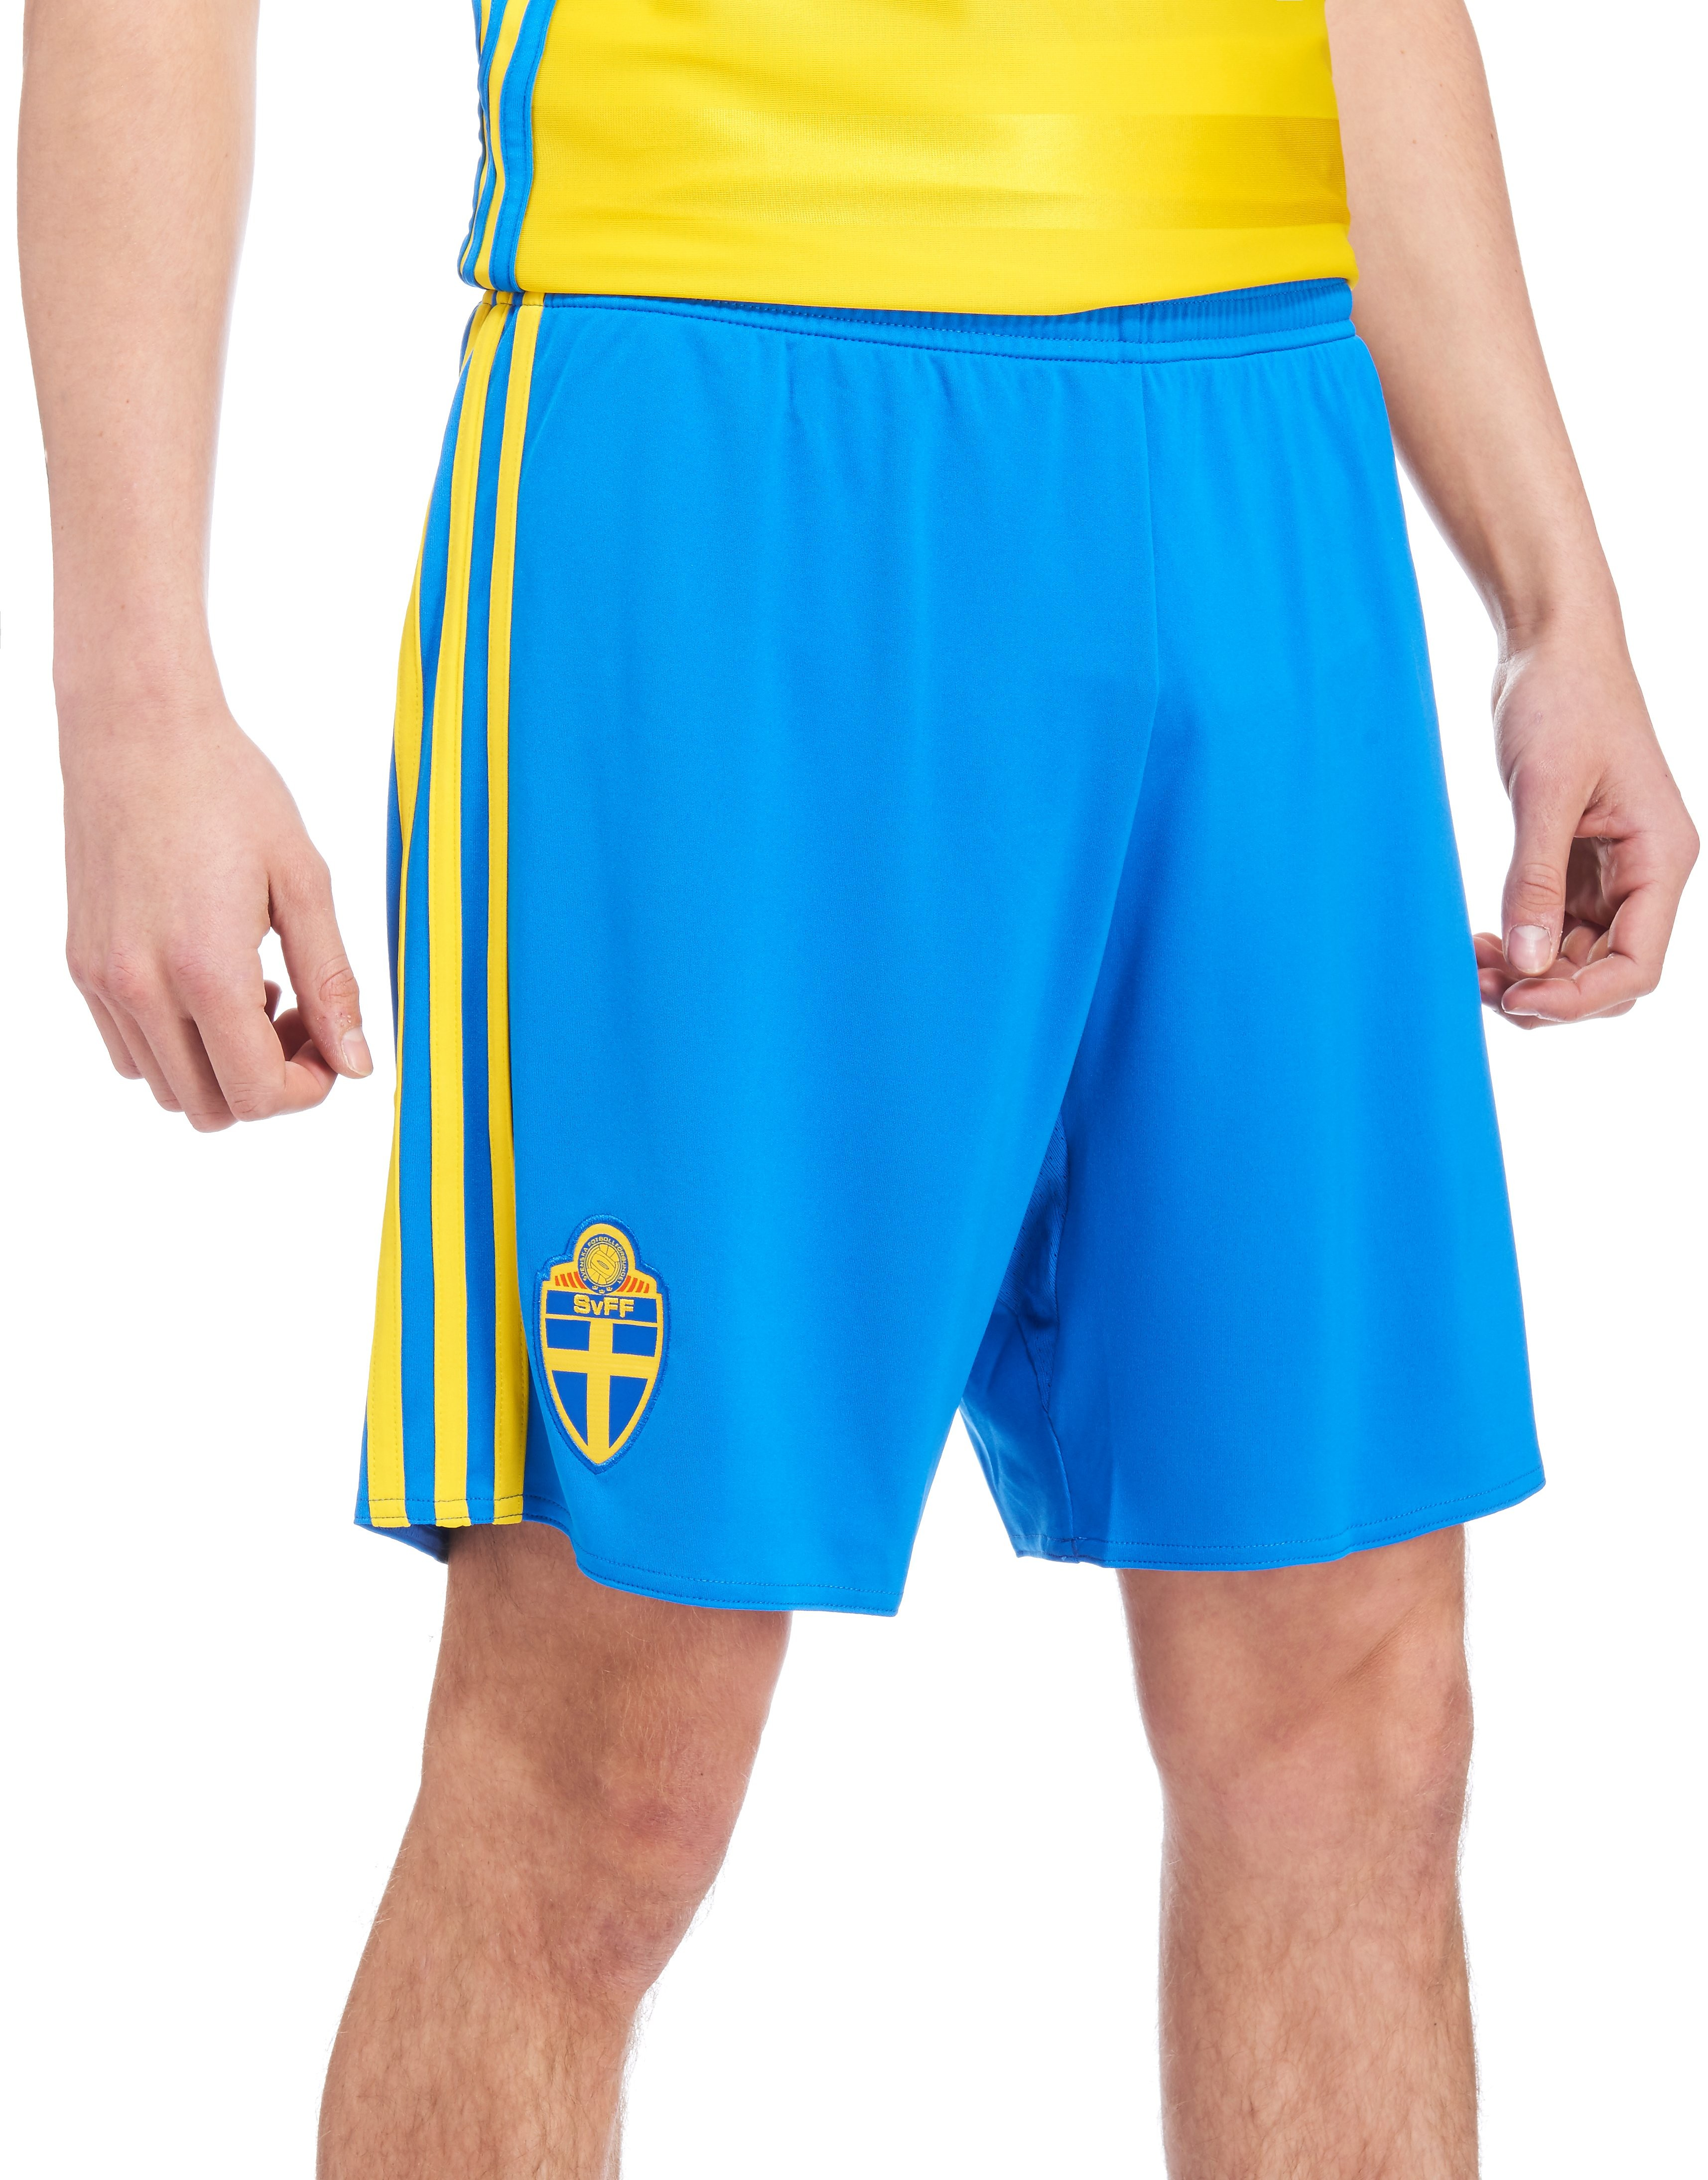 adidas Sweden 2016 Home Shorts